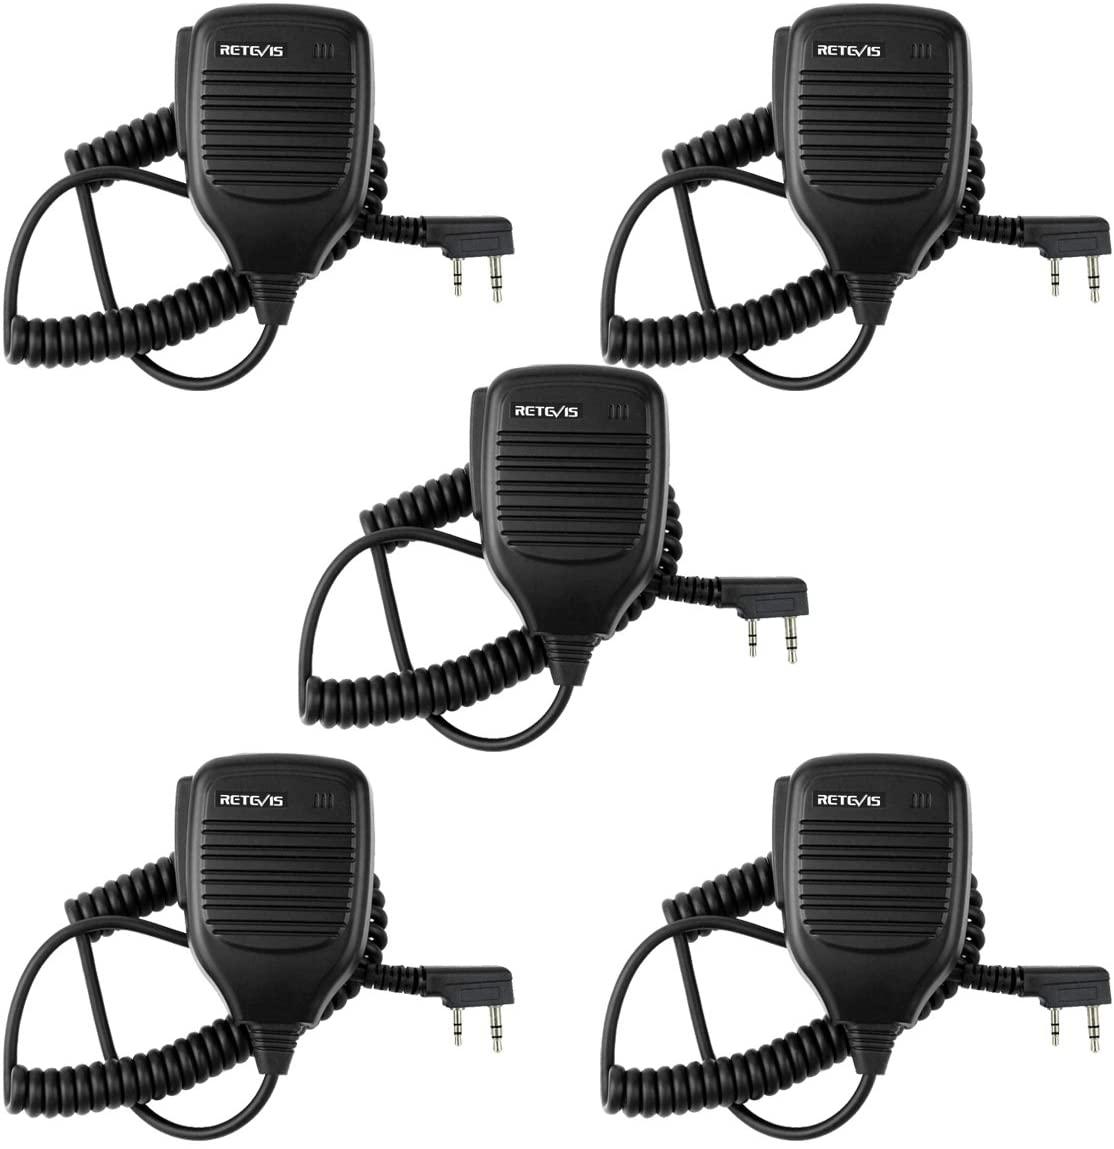 Retevis 2 Pin Shoulder Mic Speaker 2 Way Radio Microphone for Baofeng BF-888S UV-5R Kenwood Retevis H-777 RT21 RT22 RT-5R Walkie Talkie (5 Pack)